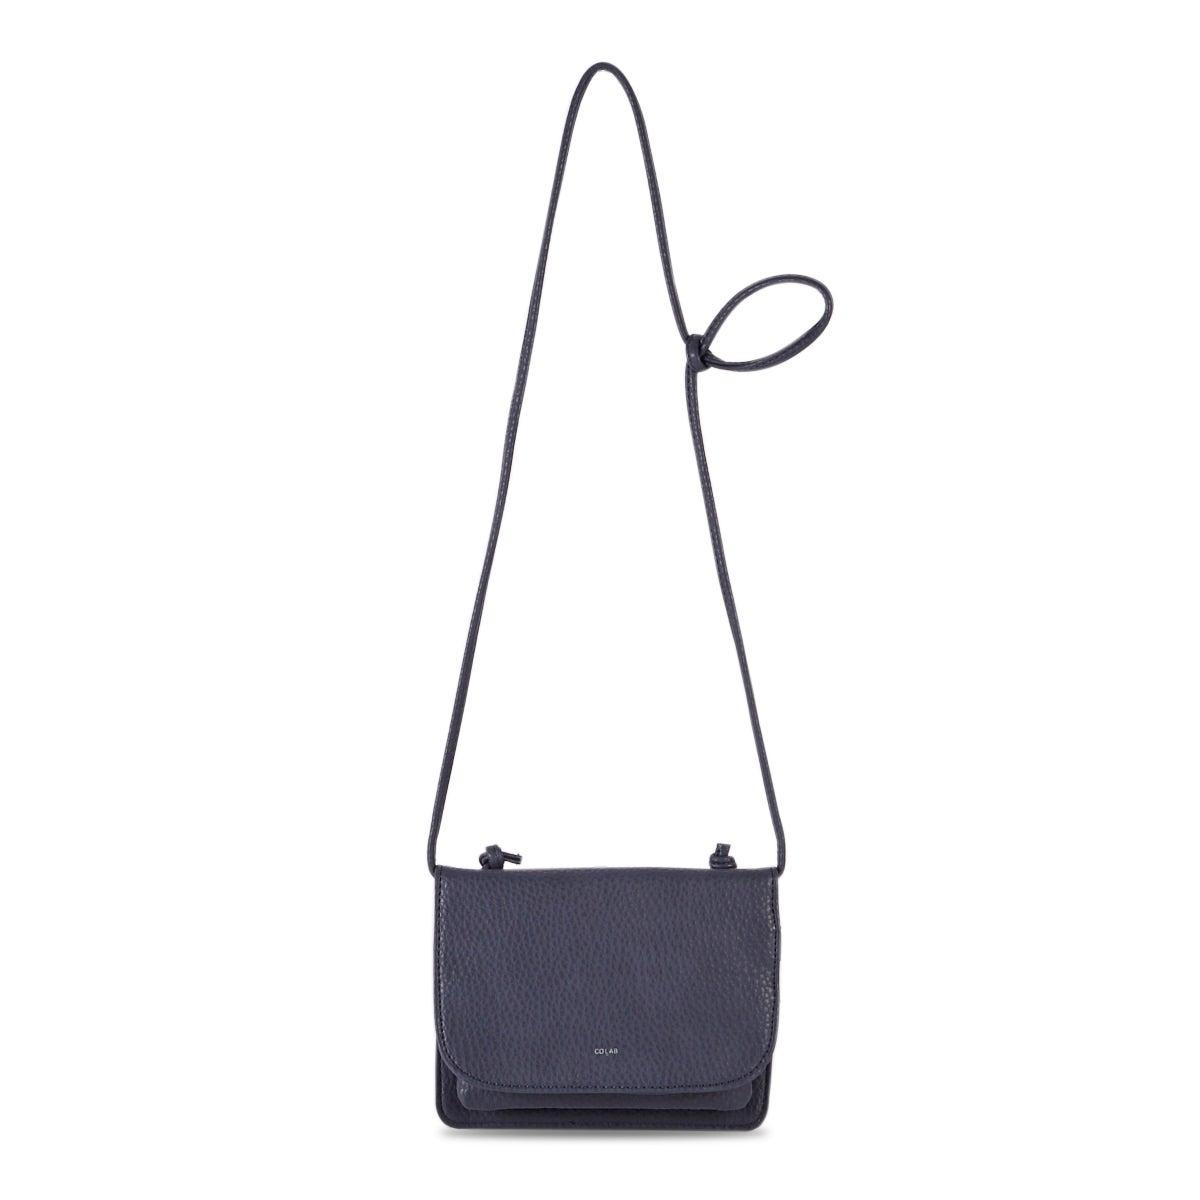 Lds Sydney Organizer bluby crossbody bag